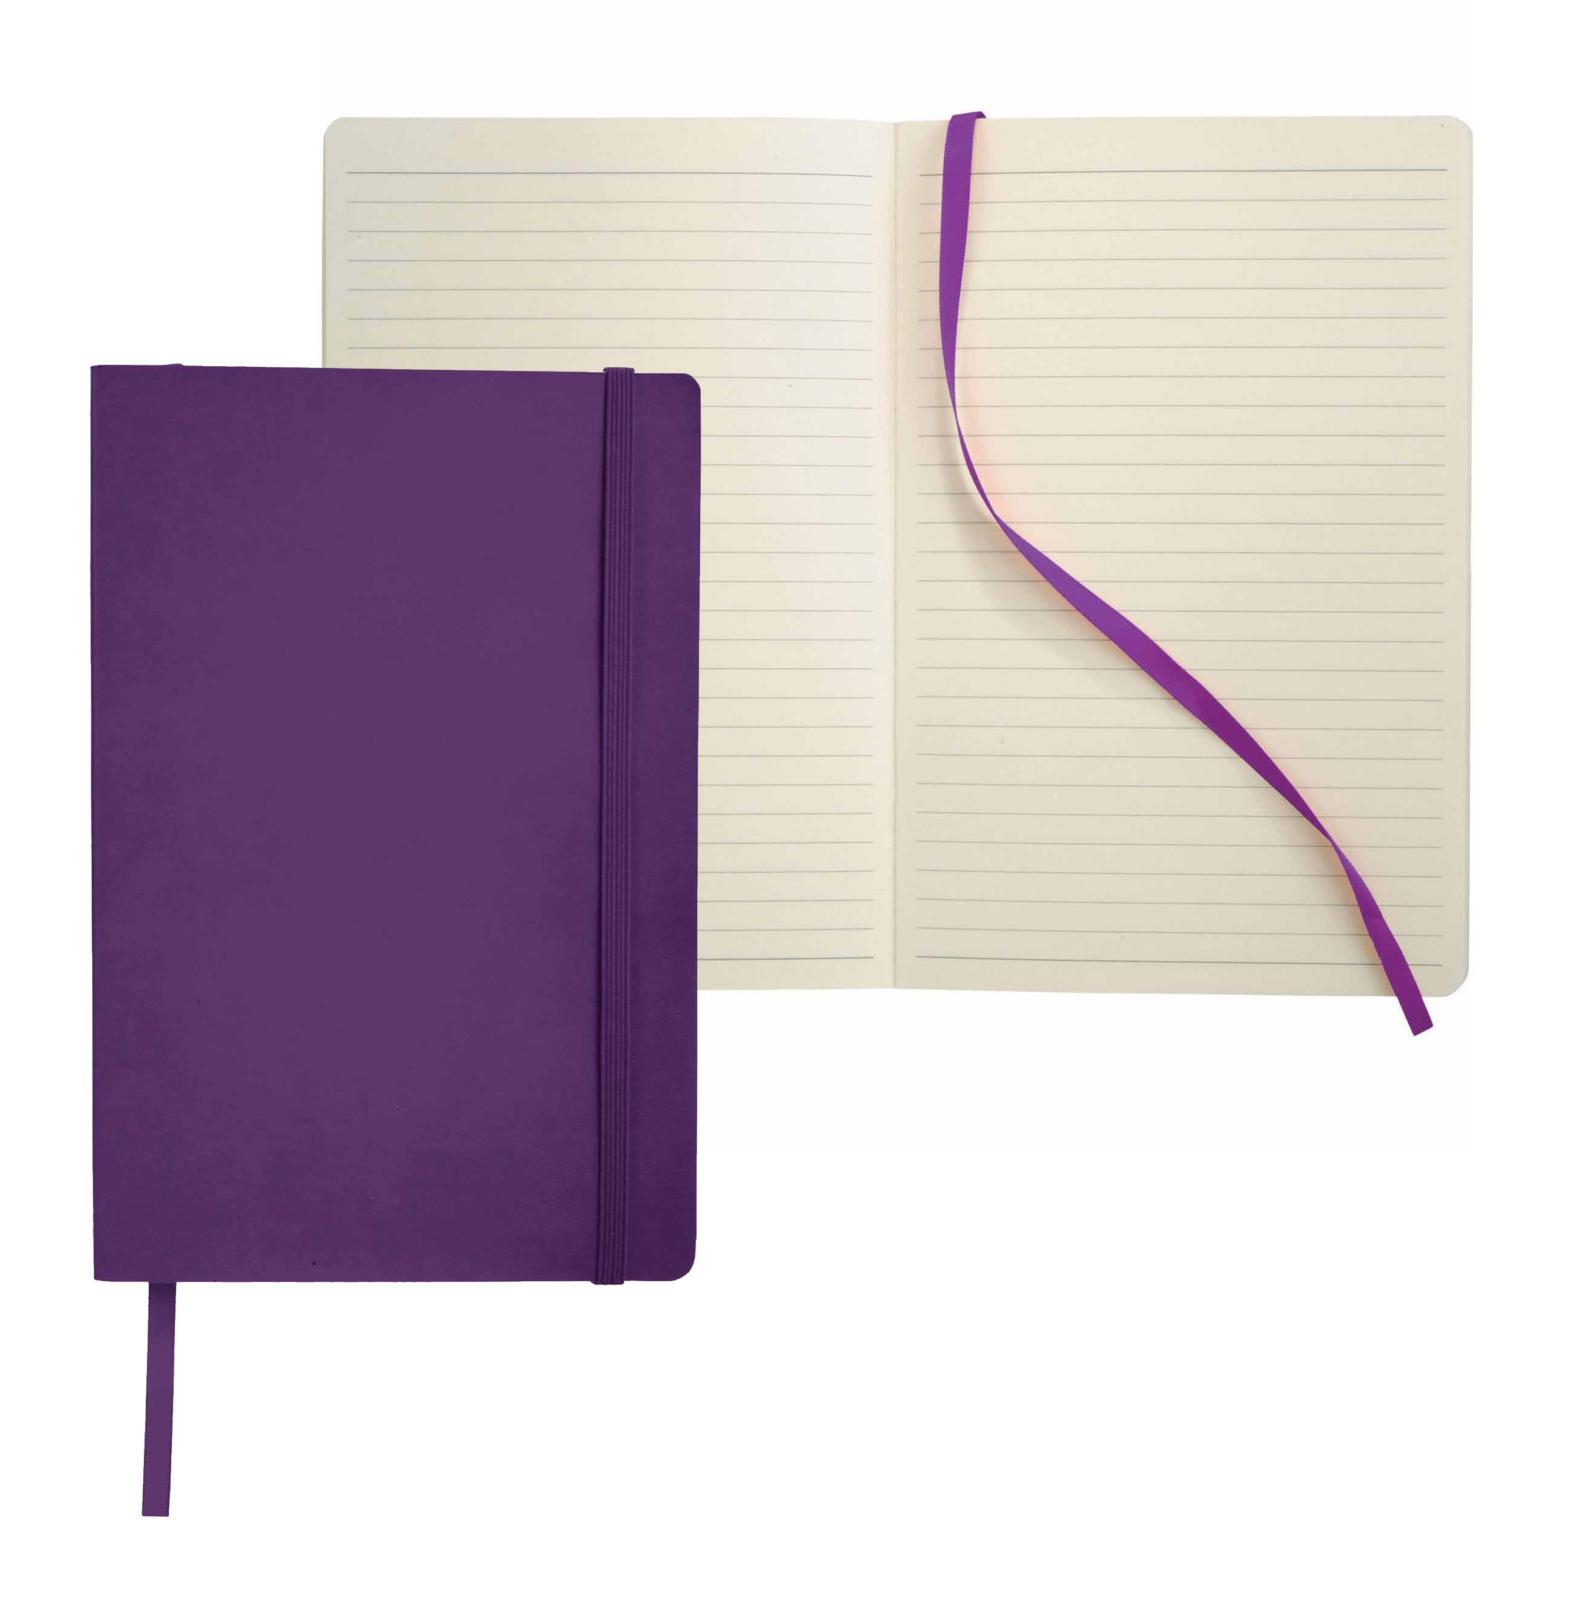 JournalBook